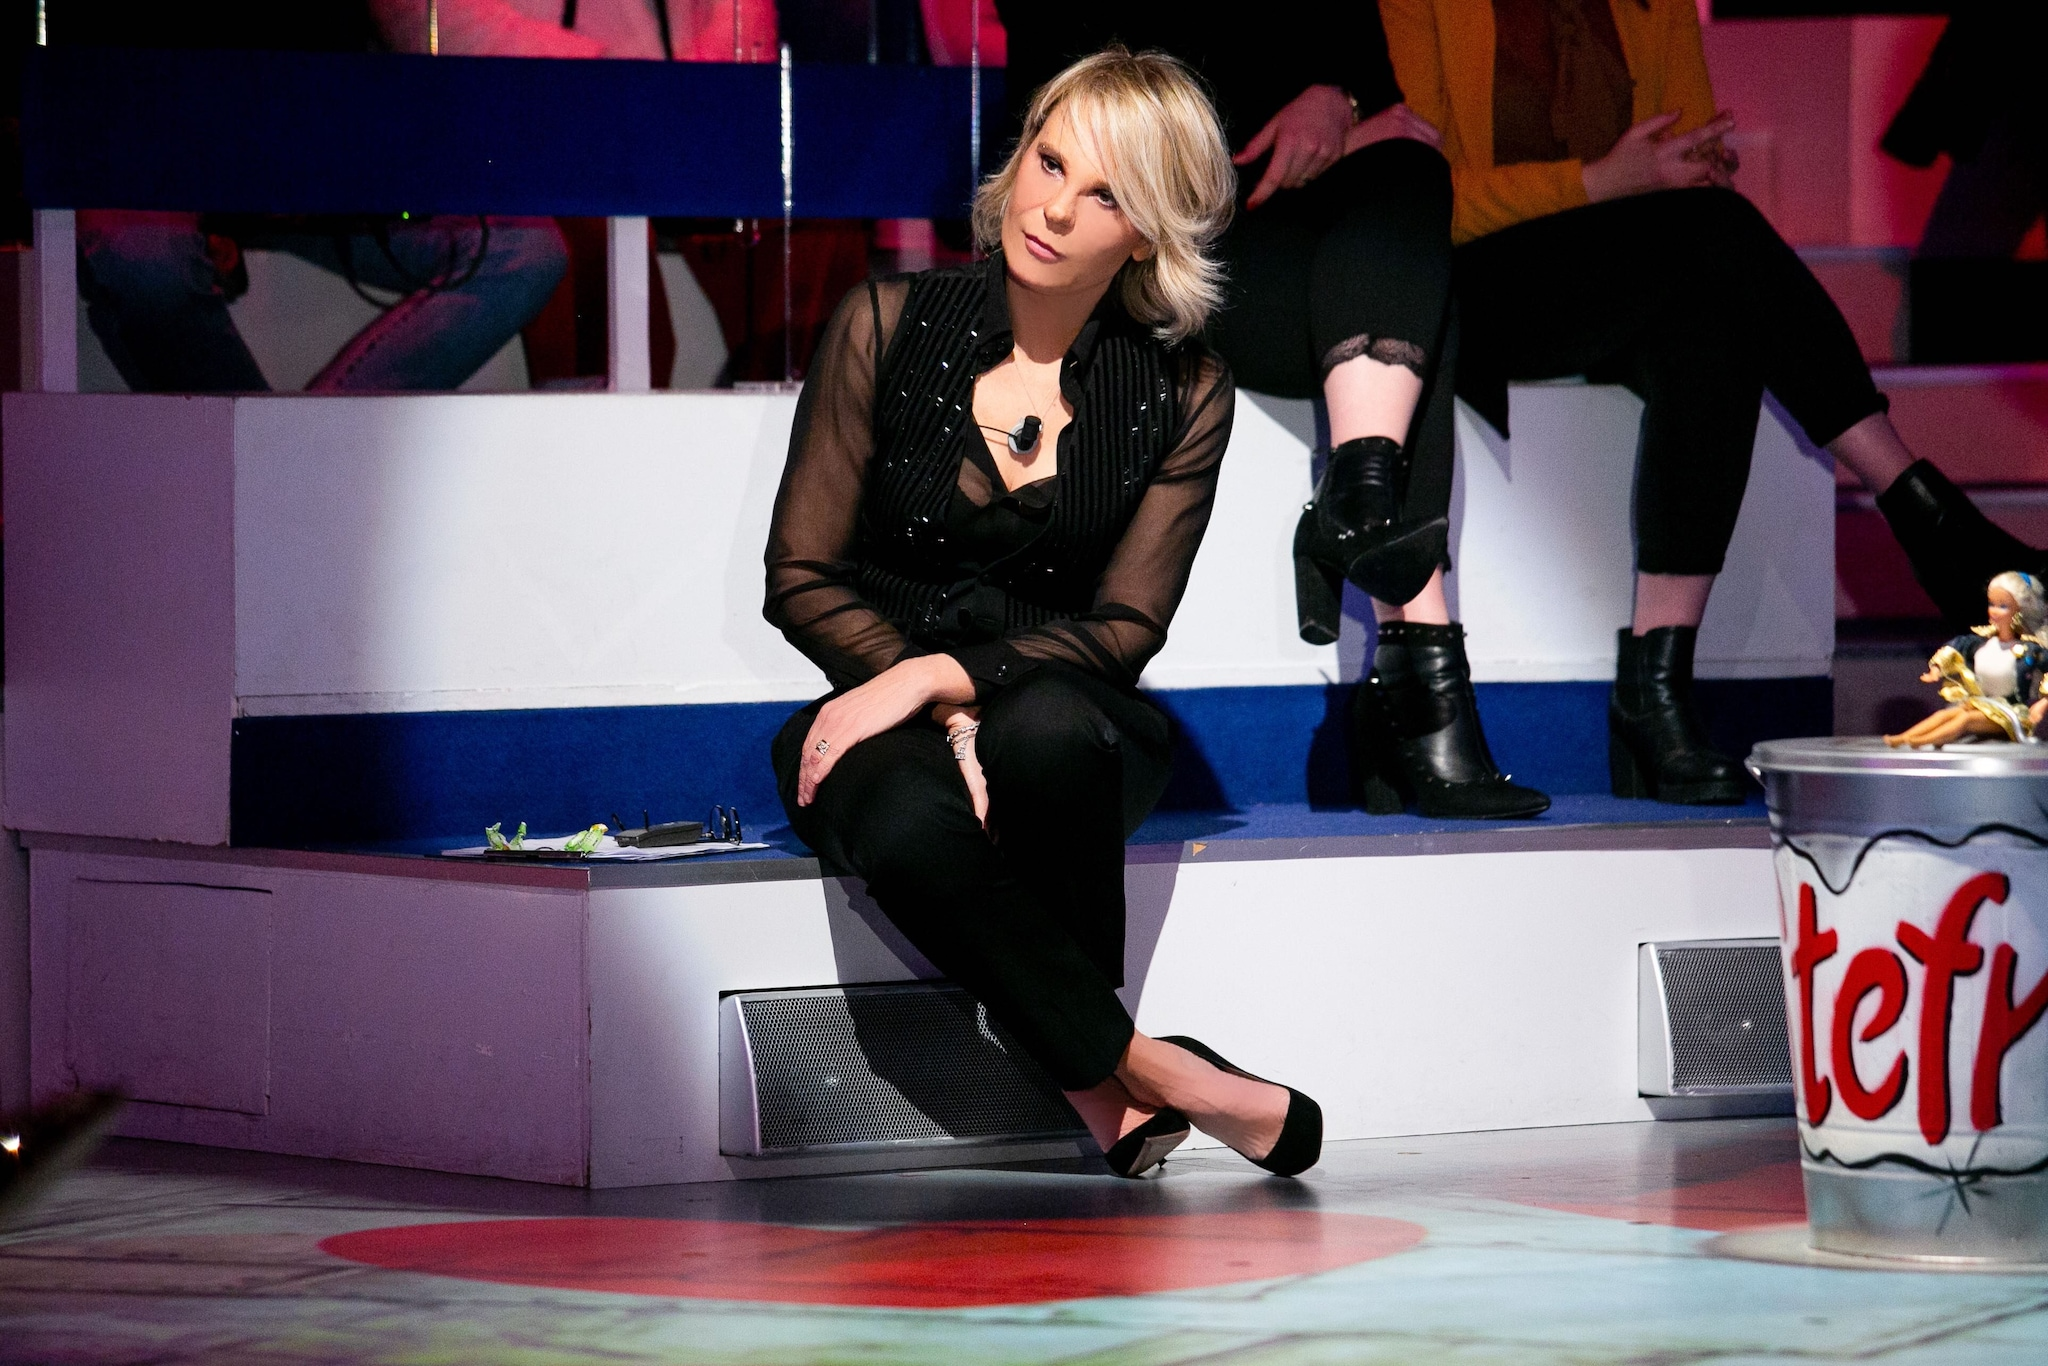 Maria in nero per l'ultima puntata